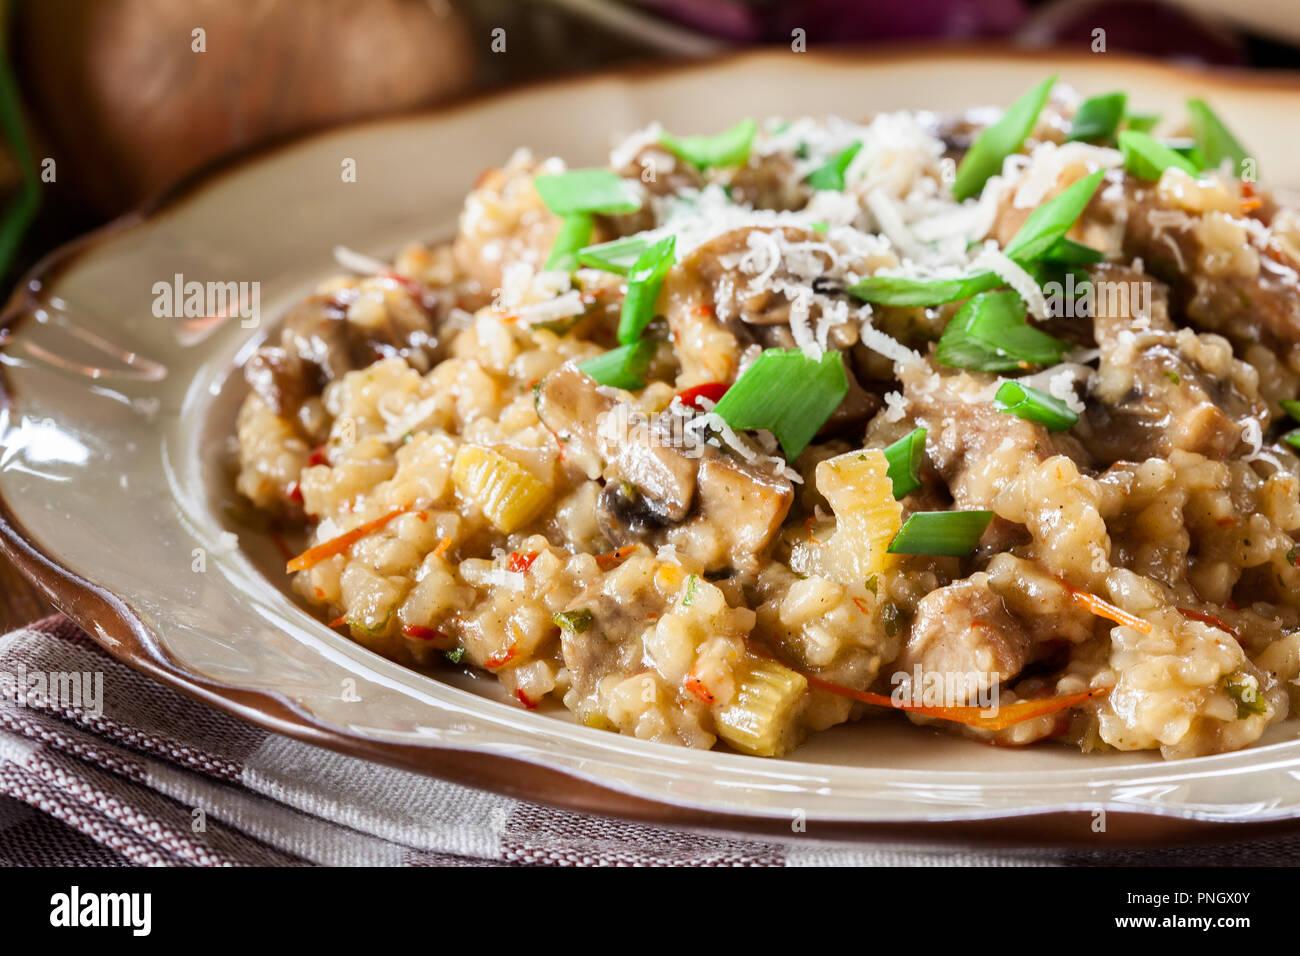 Risotto mit Champignon Champignons, Speck und Parmesan. Italienische Küche Stockbild